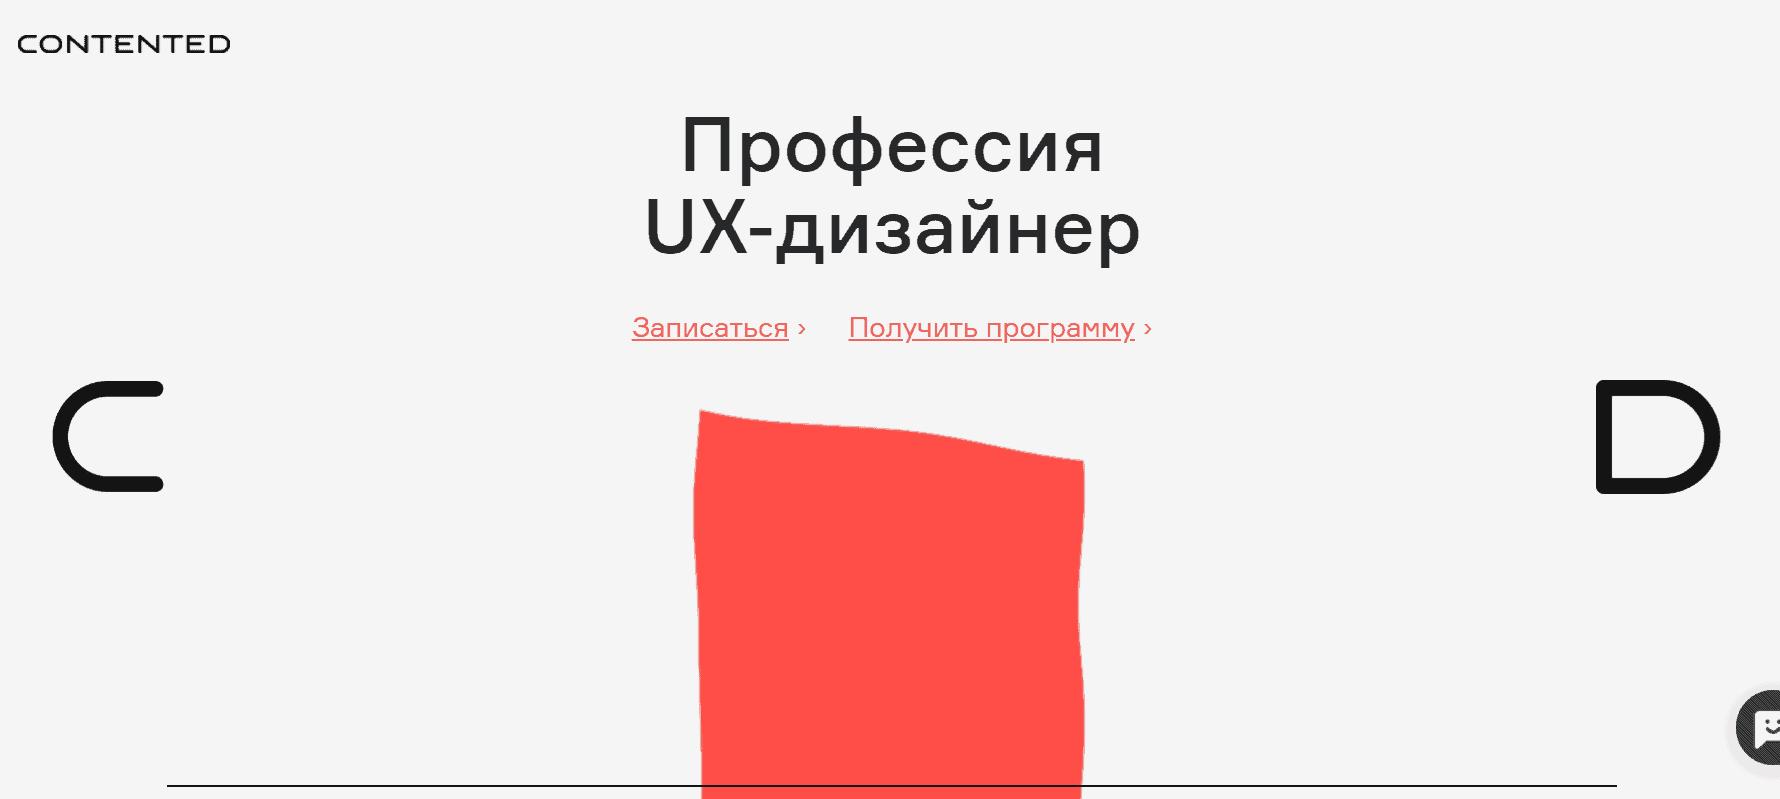 Профессия UX/UI-дизайнер от Contented